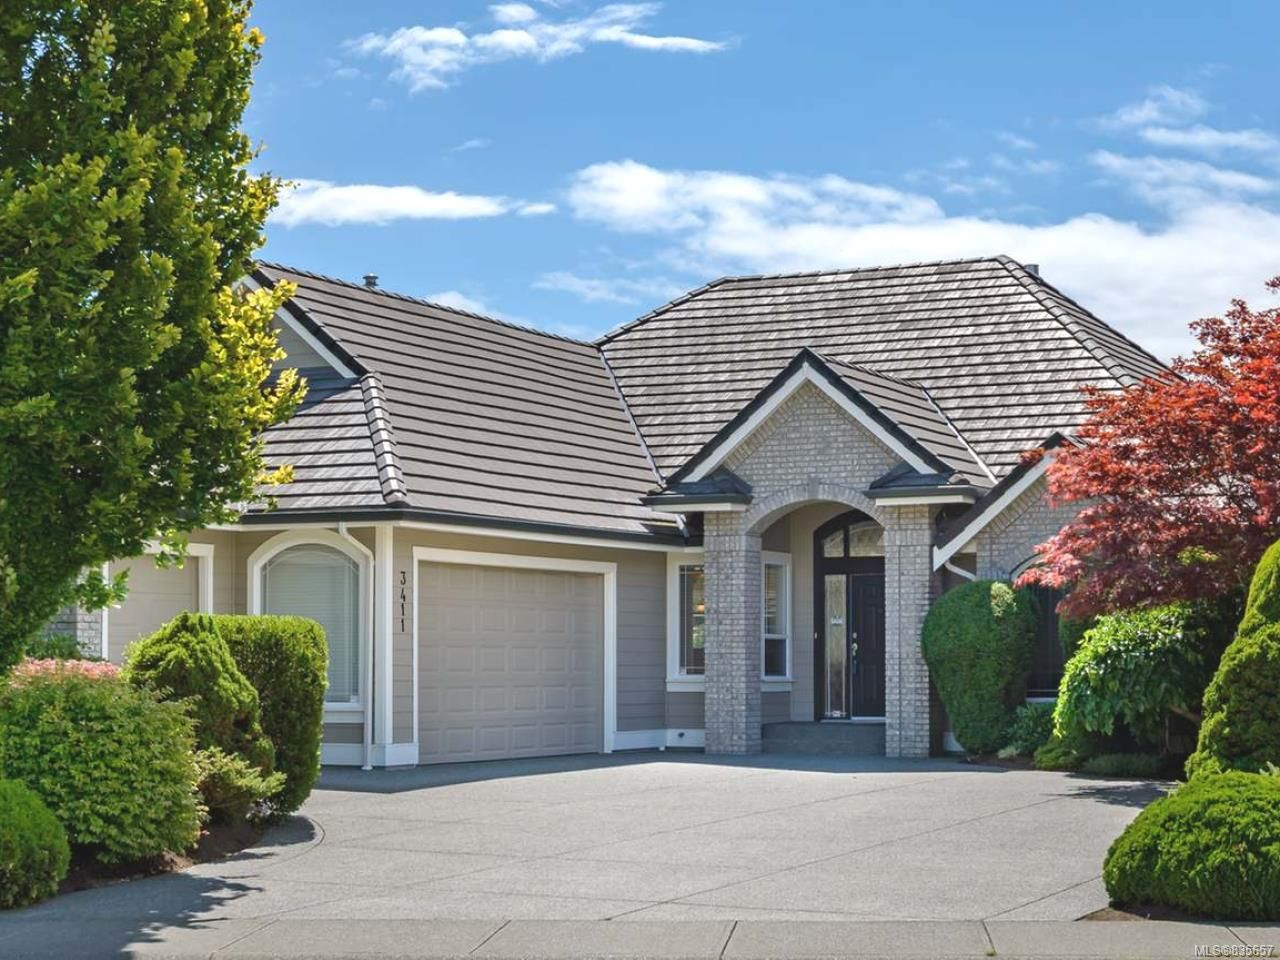 Main Photo: 3411 Royal Vista Way in COURTENAY: CV Crown Isle House for sale (Comox Valley)  : MLS®# 835657